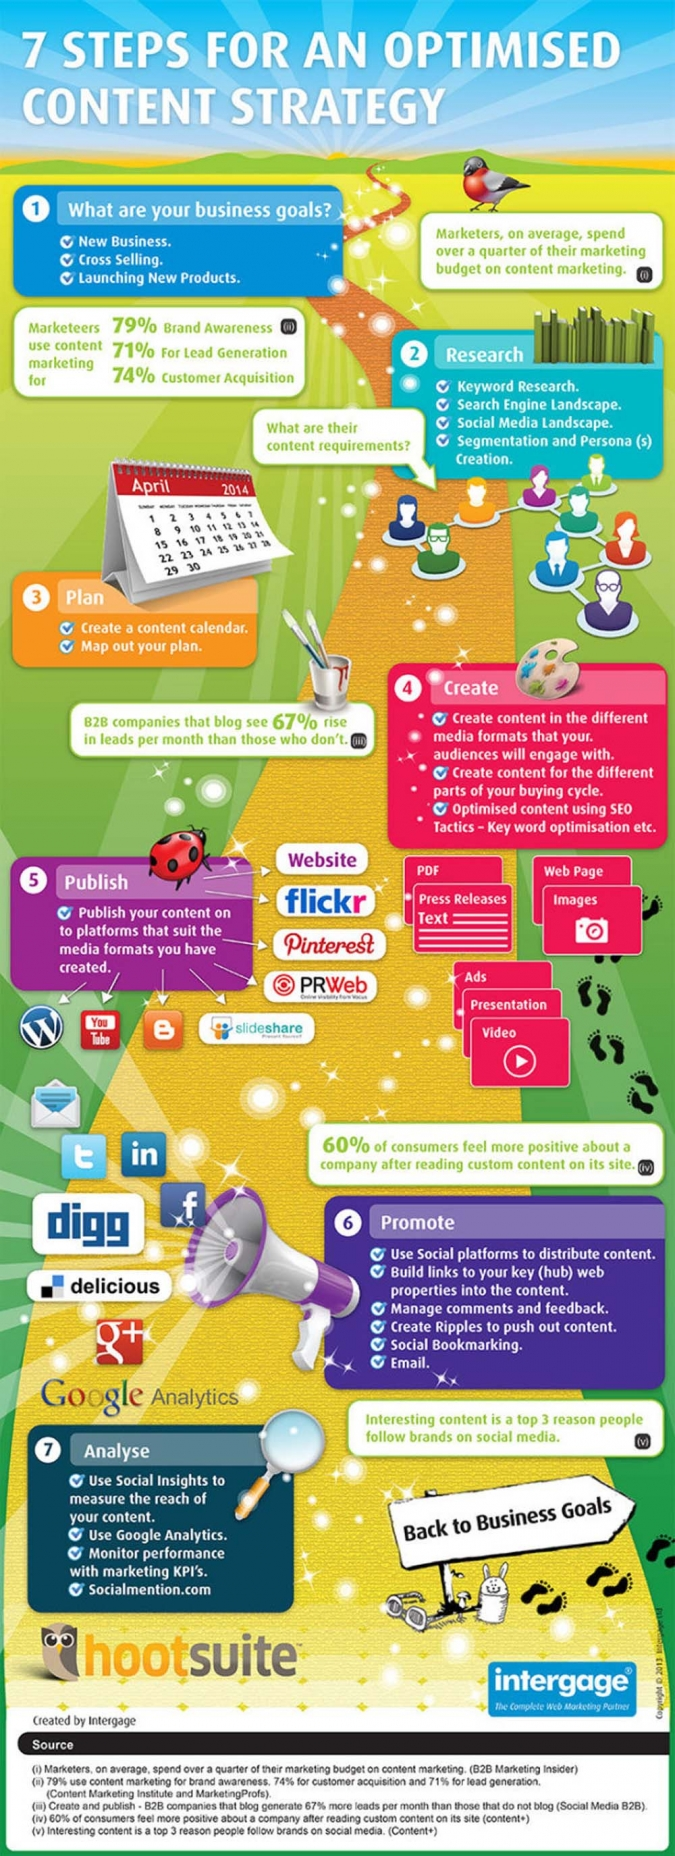 infografik-content-marketing-strategie-tipps-tricks-unternehmen-social-media-content-seo